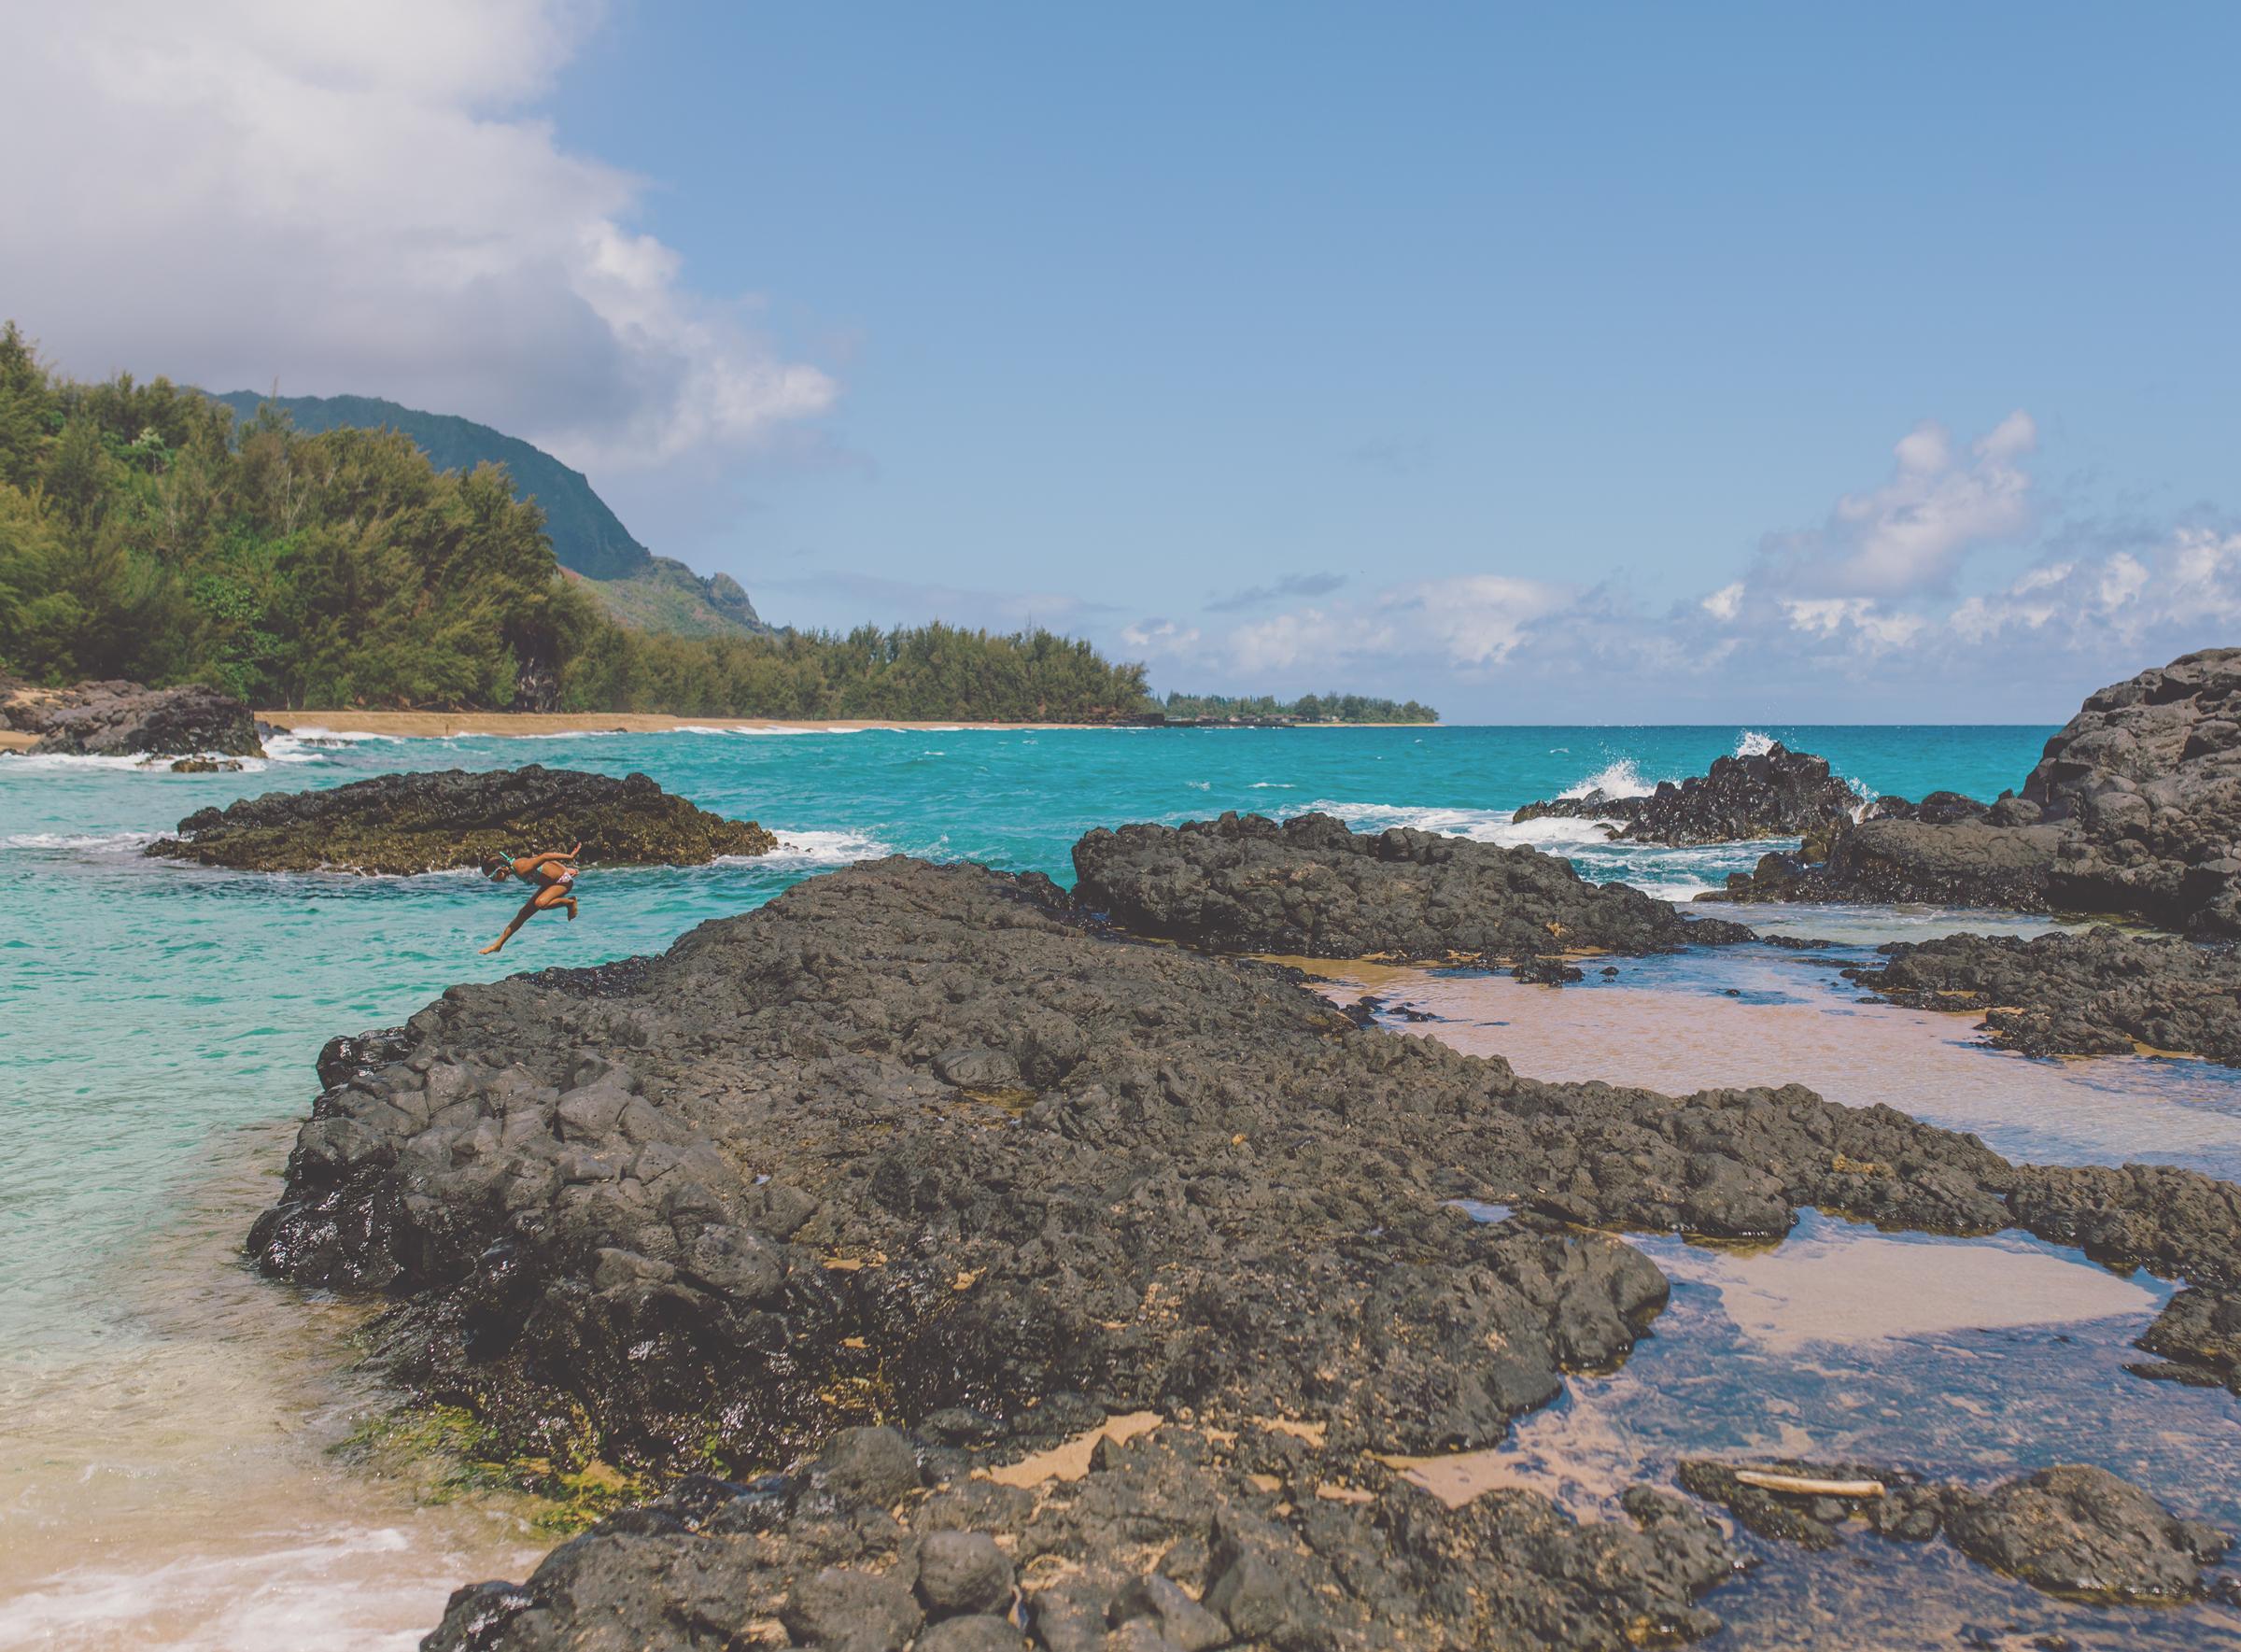 IMG_2469--KAUAI-HAWAII-JENNIFER-PICARD-PHOTOGRAPHY.jpg